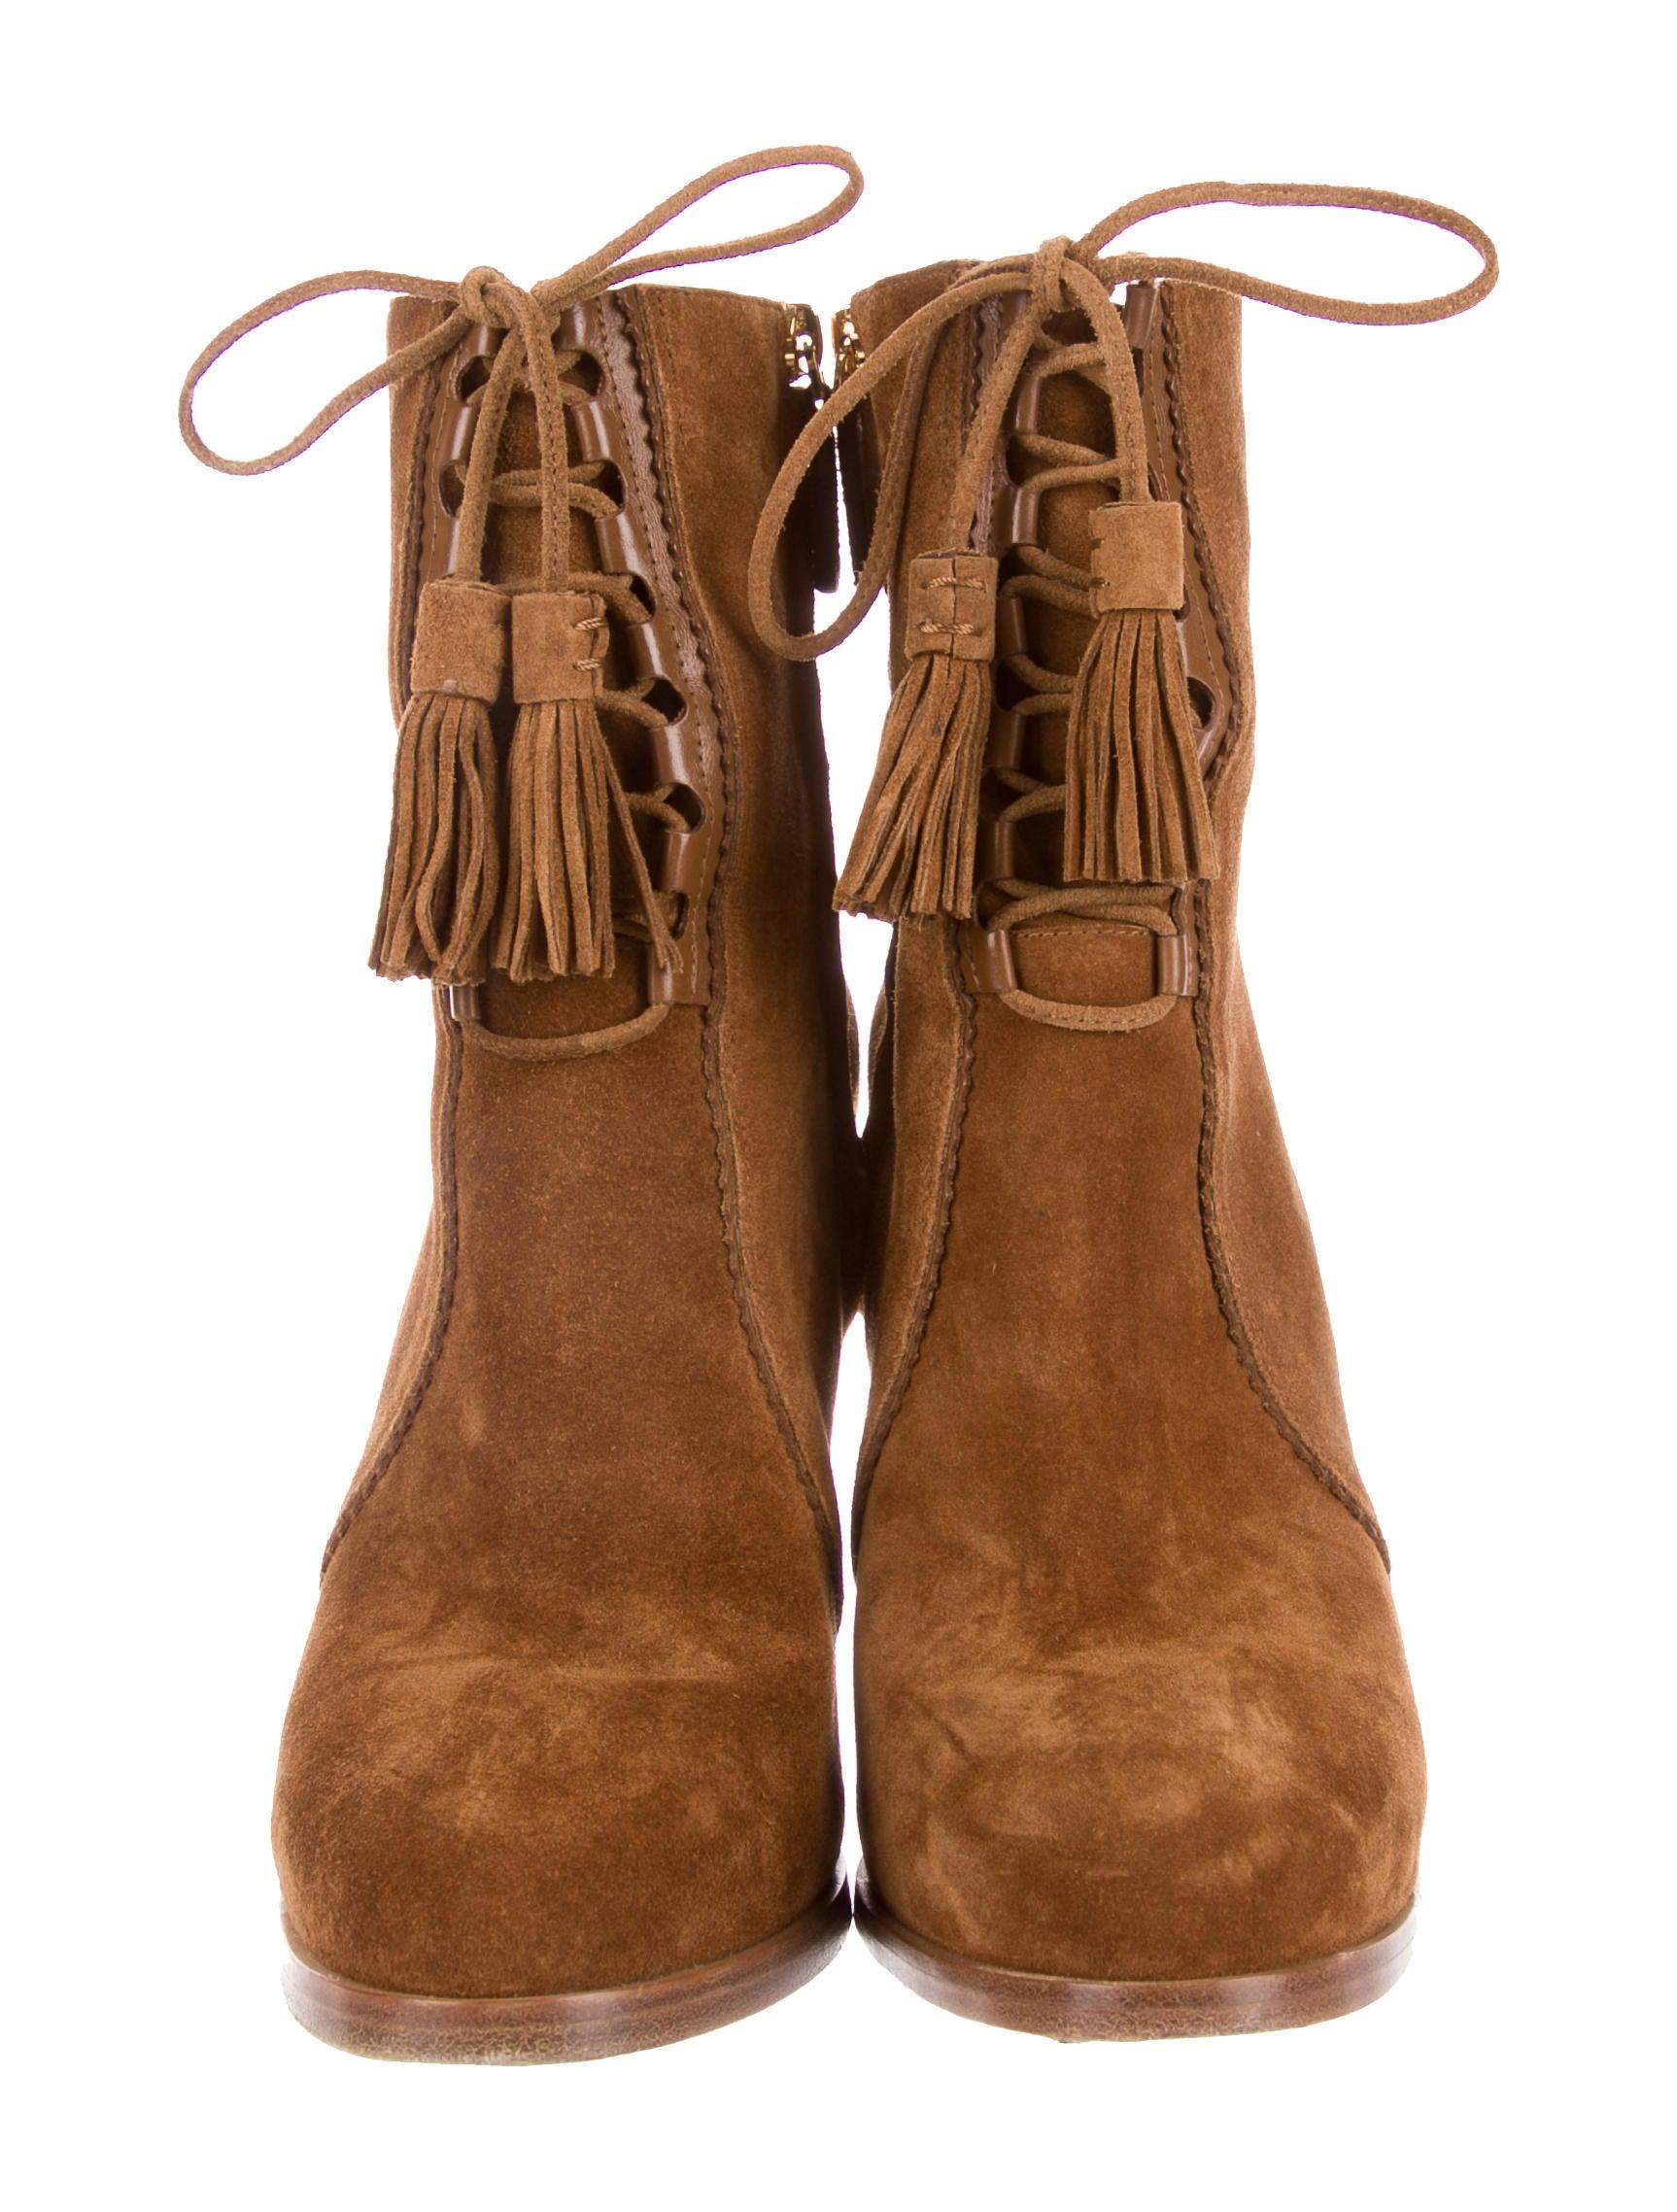 michael kors suede lace up ankle boots shoes mic56752. Black Bedroom Furniture Sets. Home Design Ideas